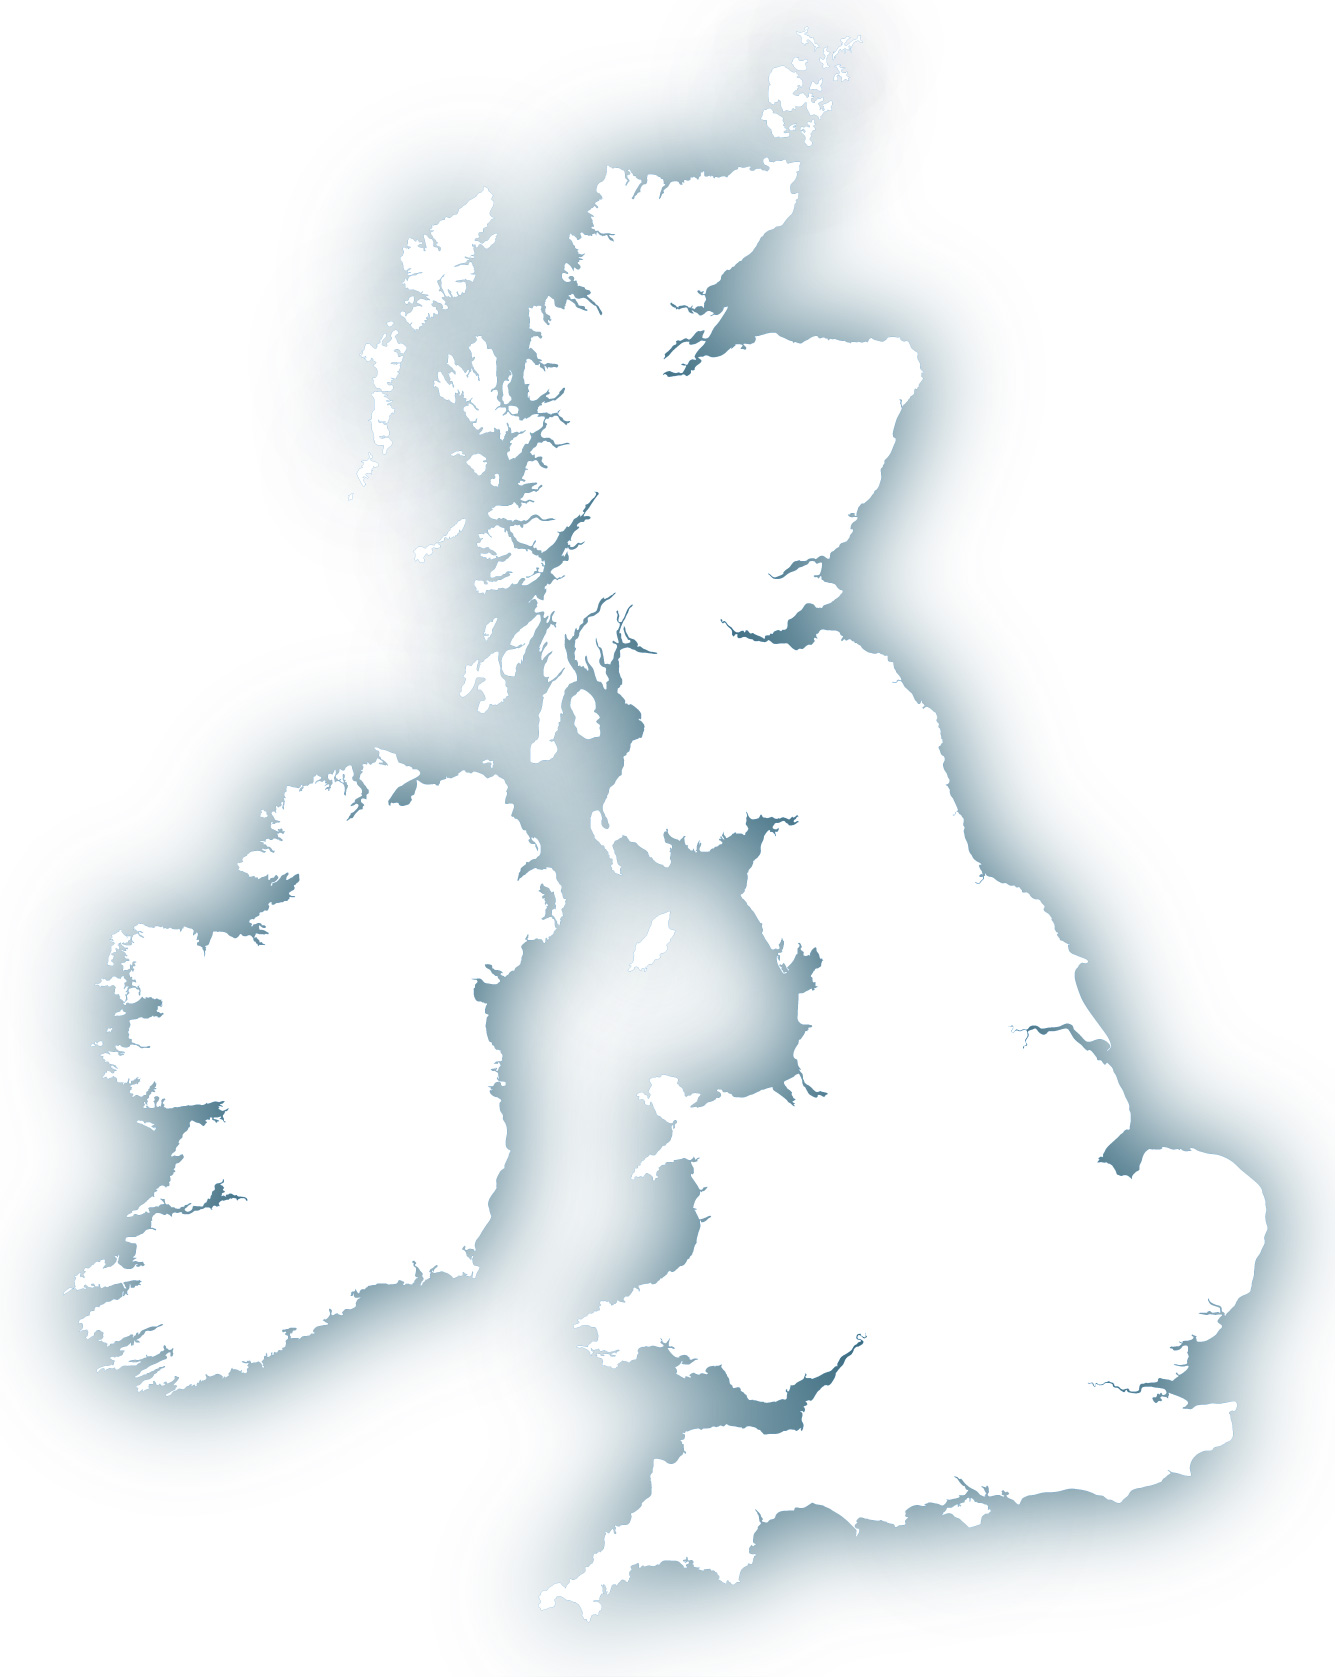 Blank Map Of British Isles And Ireland